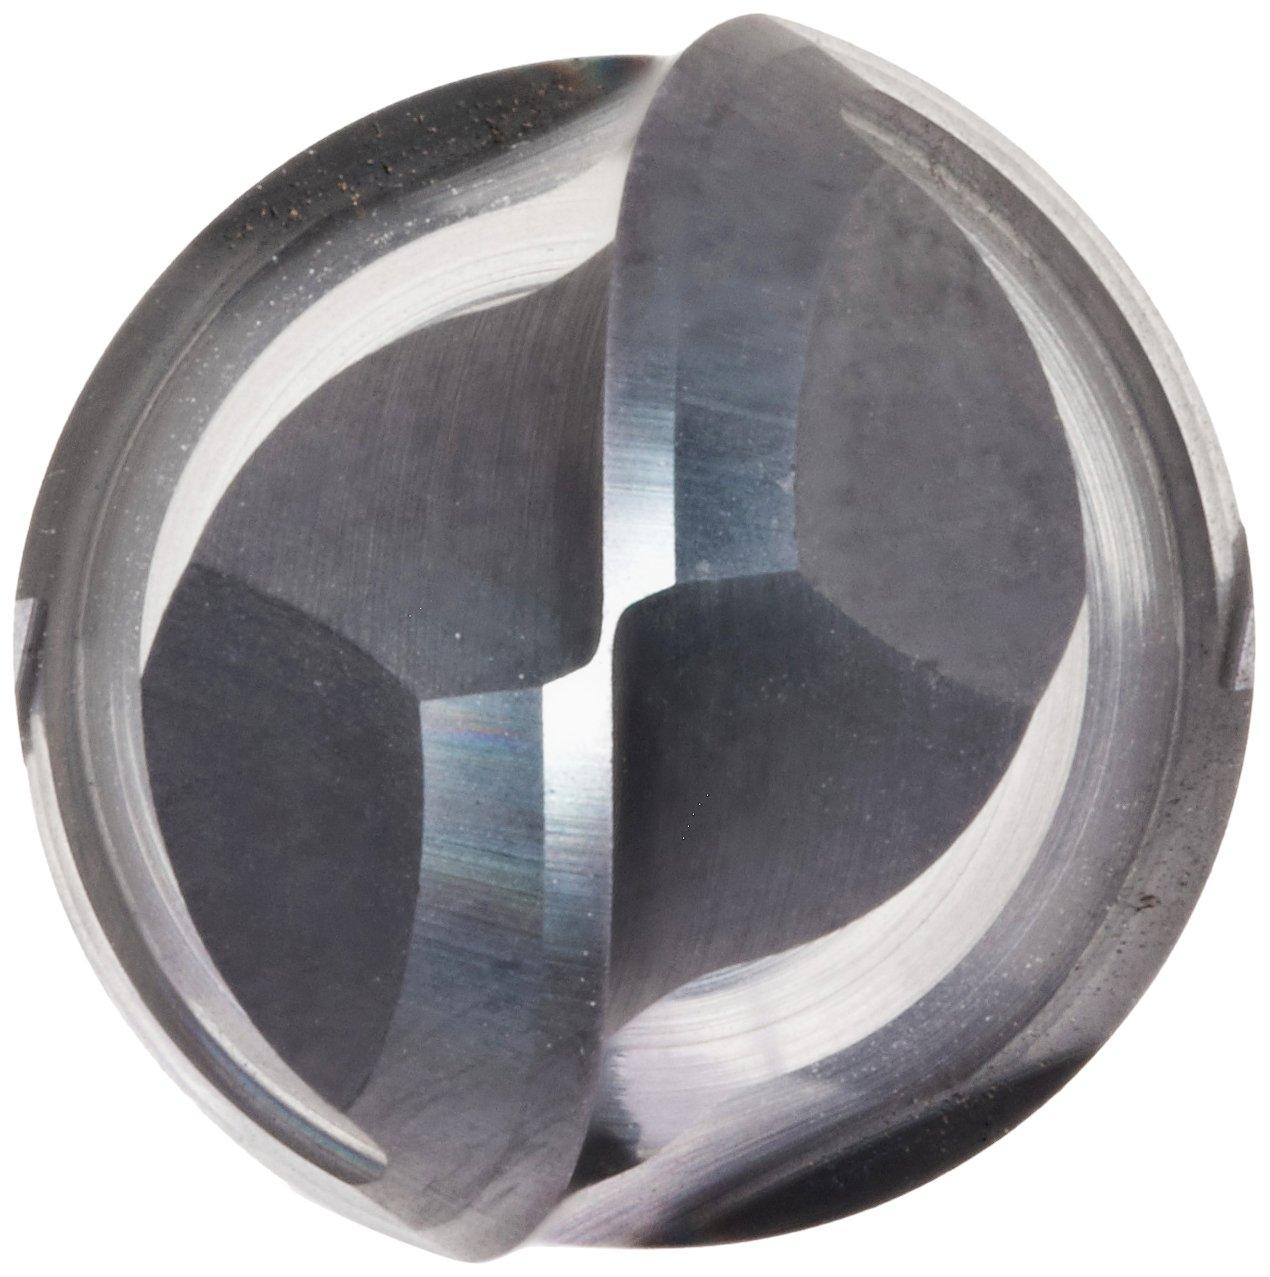 Melin Tool AMGS-B Carbide Micro Ball Nose End Mill 1.5000 Overall Length 30 Deg Helix 0.0190 Cutting Diameter 0.125 Shank Diameter 2 Flutes AlTiN Monolayer Finish